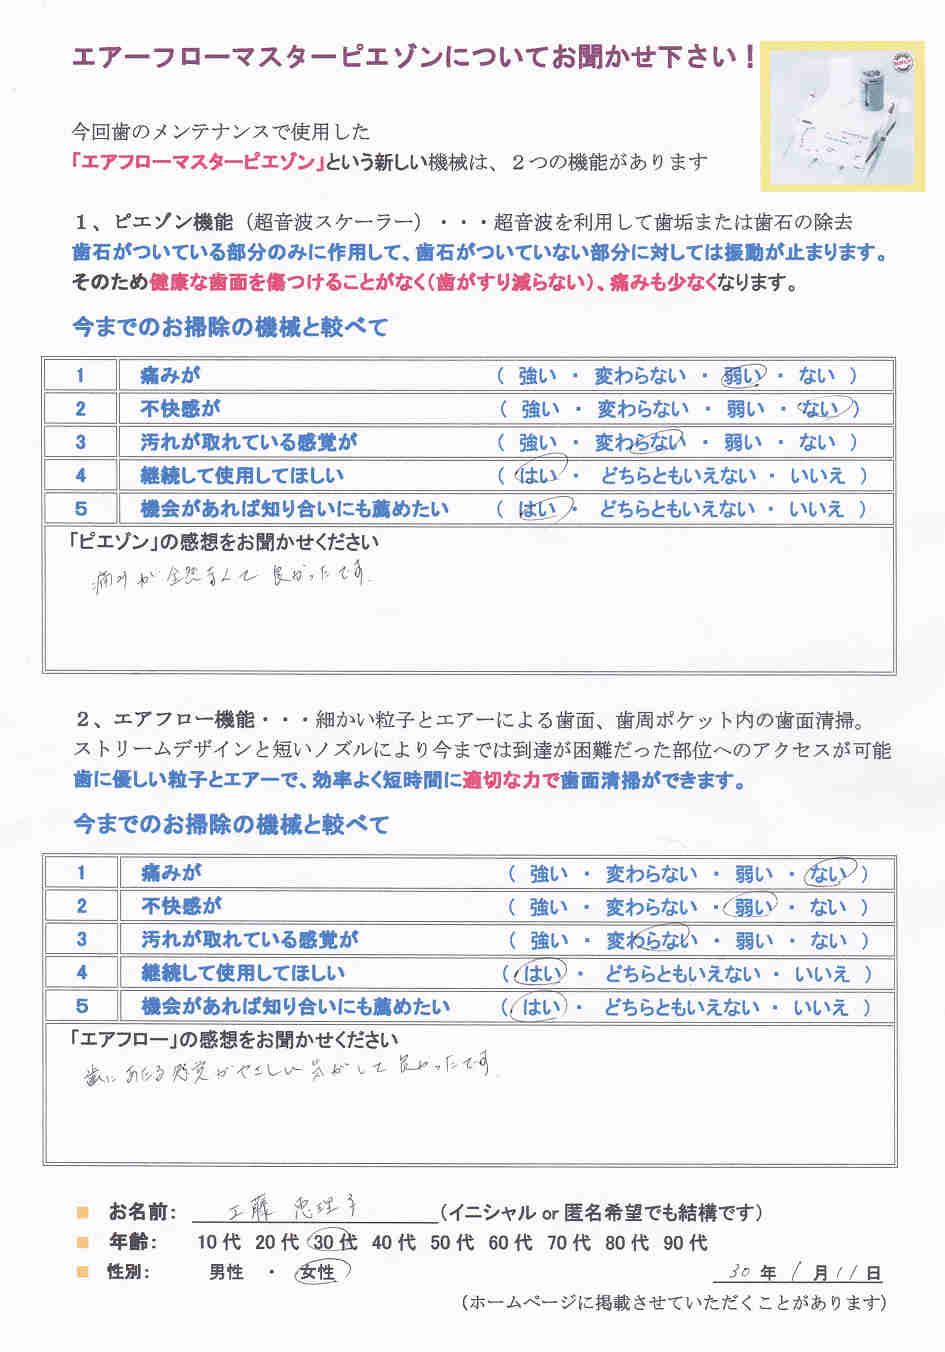 http://www.hayashi-dental.info/resize1213.jpg